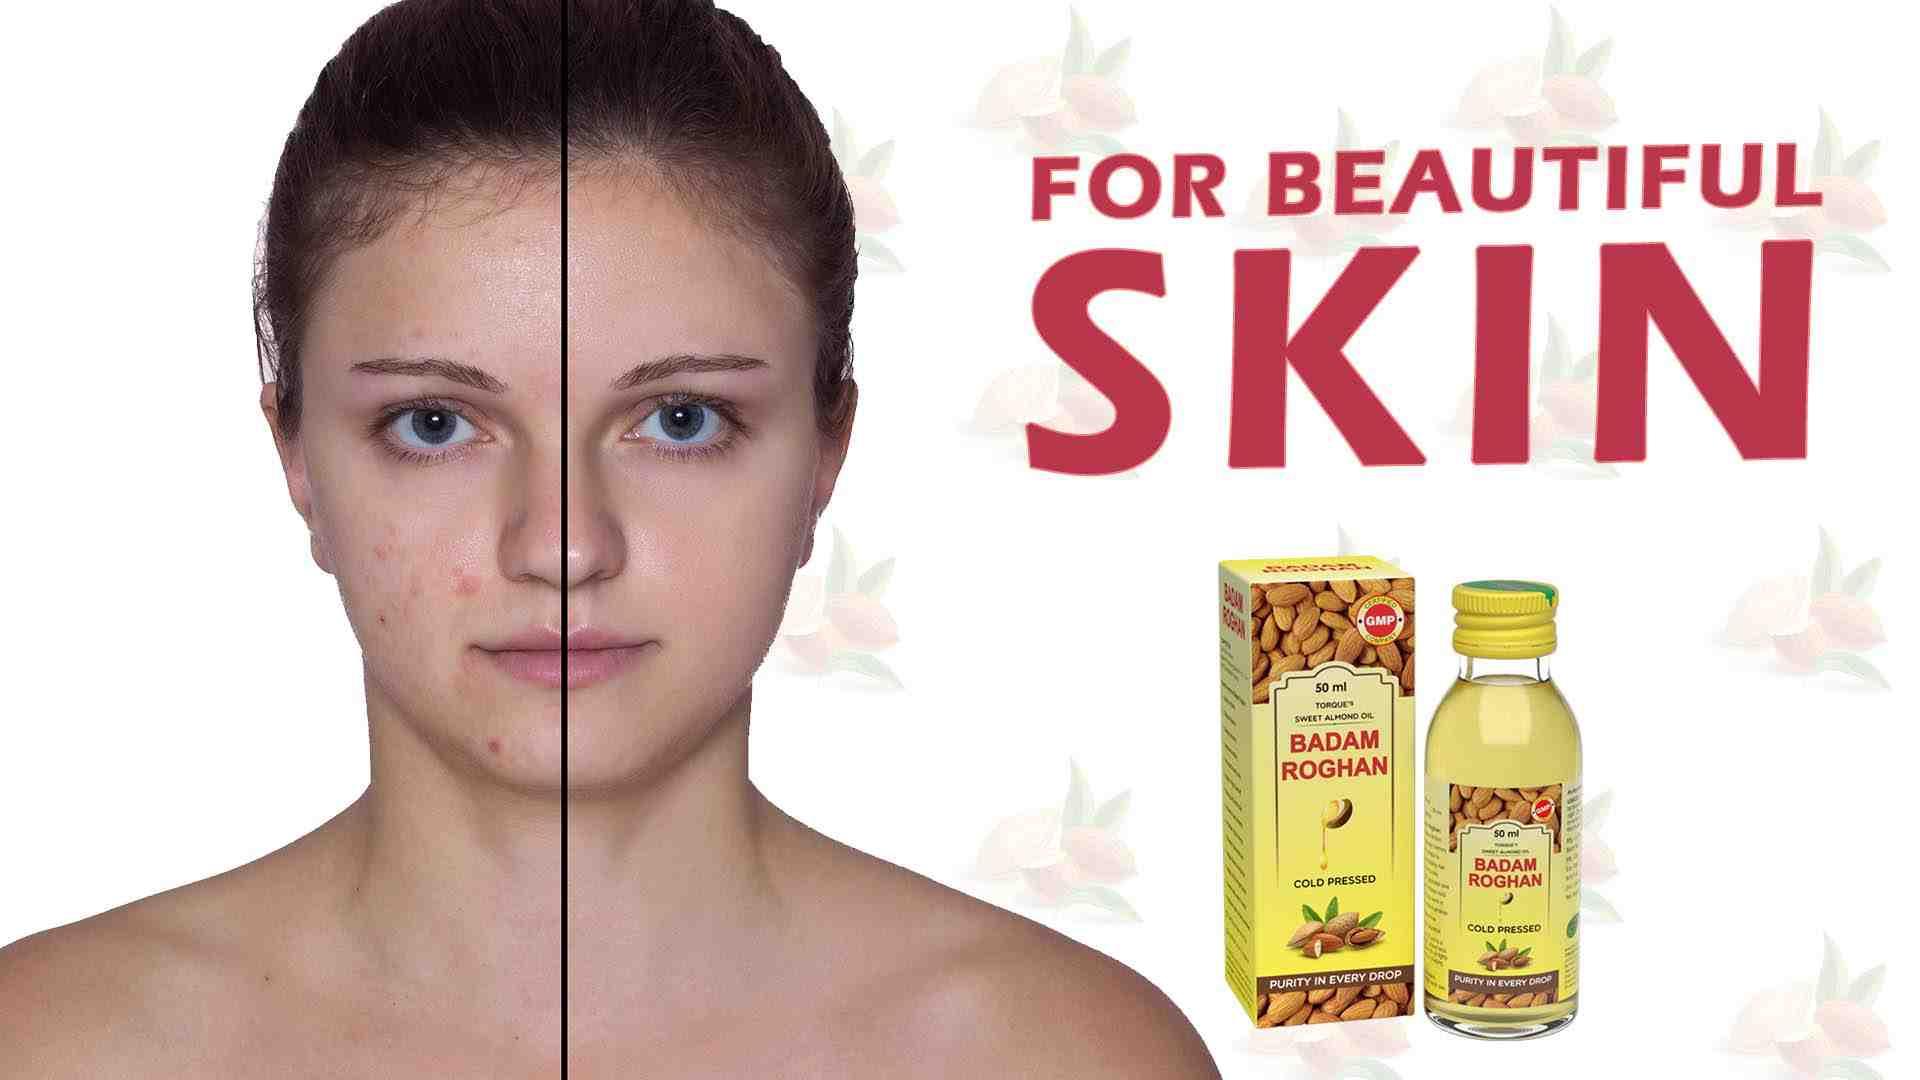 Badam for Skin